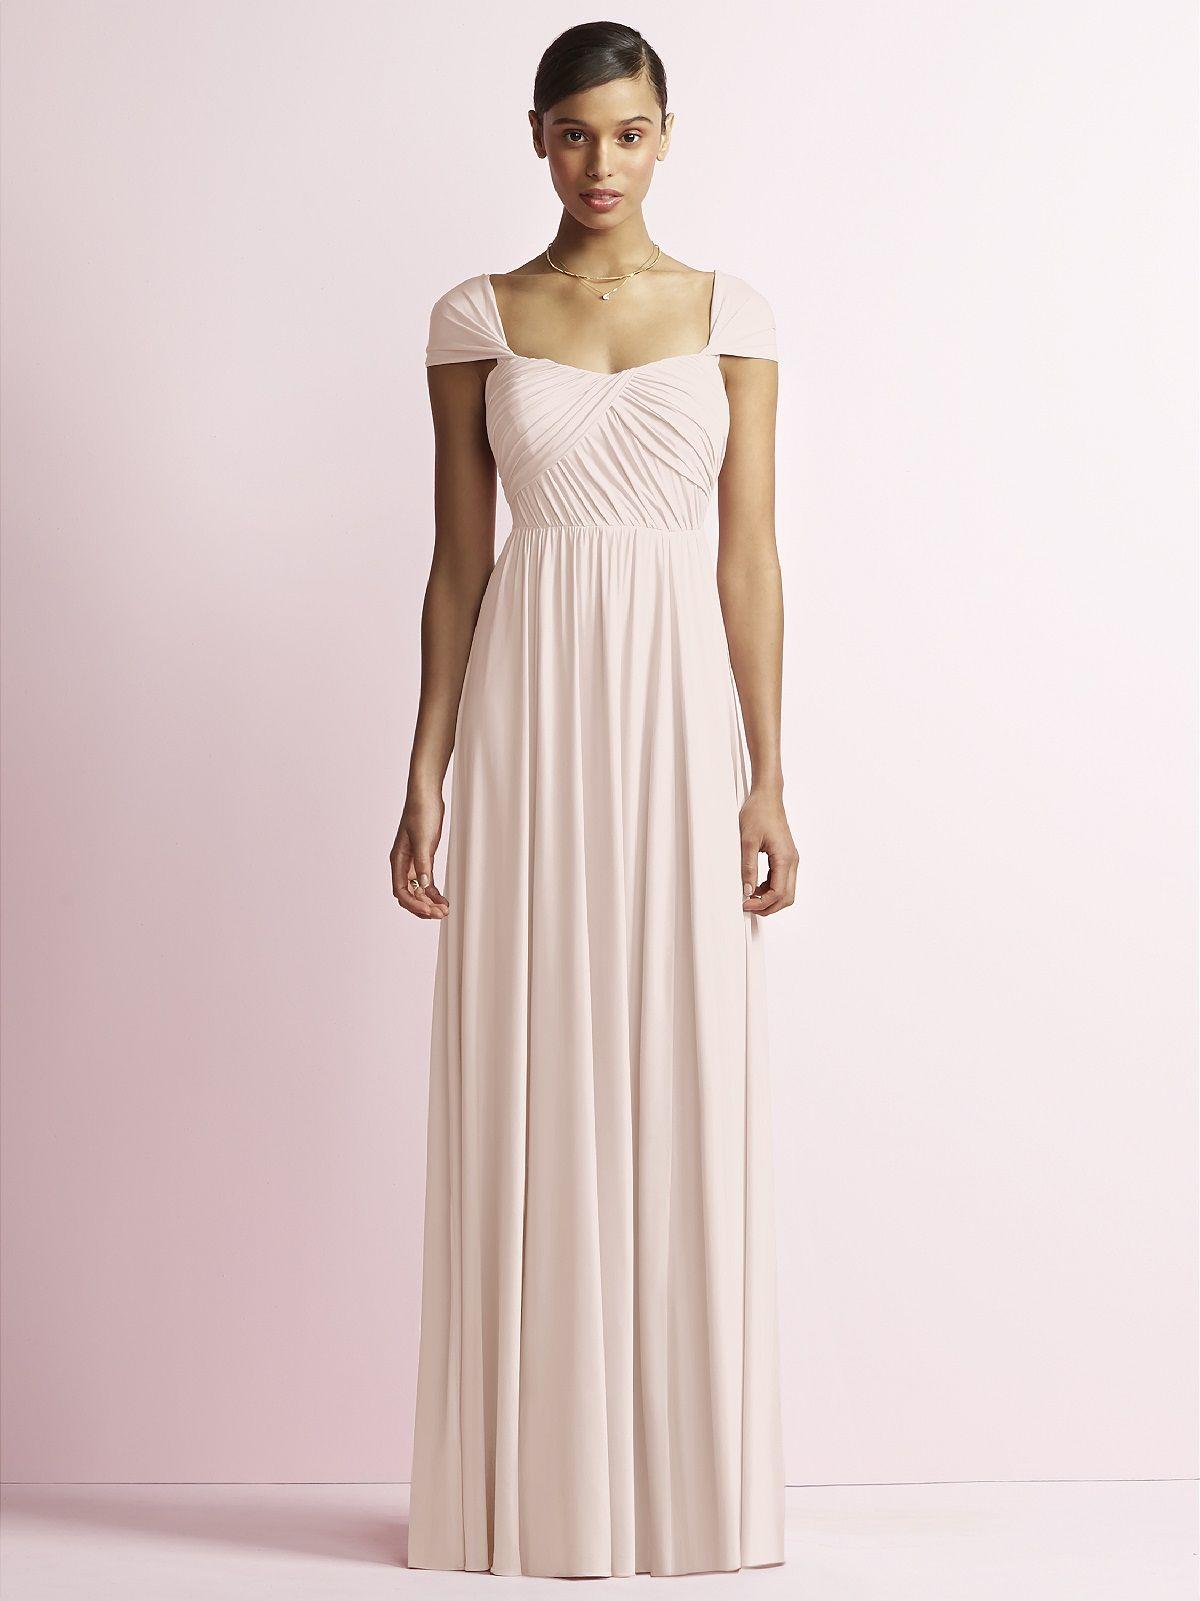 Jy jenny yoo bridesmaid style jy504 weddings jy jenny yoo bridesmaid style jy504 dessy bridesmaidbridesmaid dress ombrellifo Images